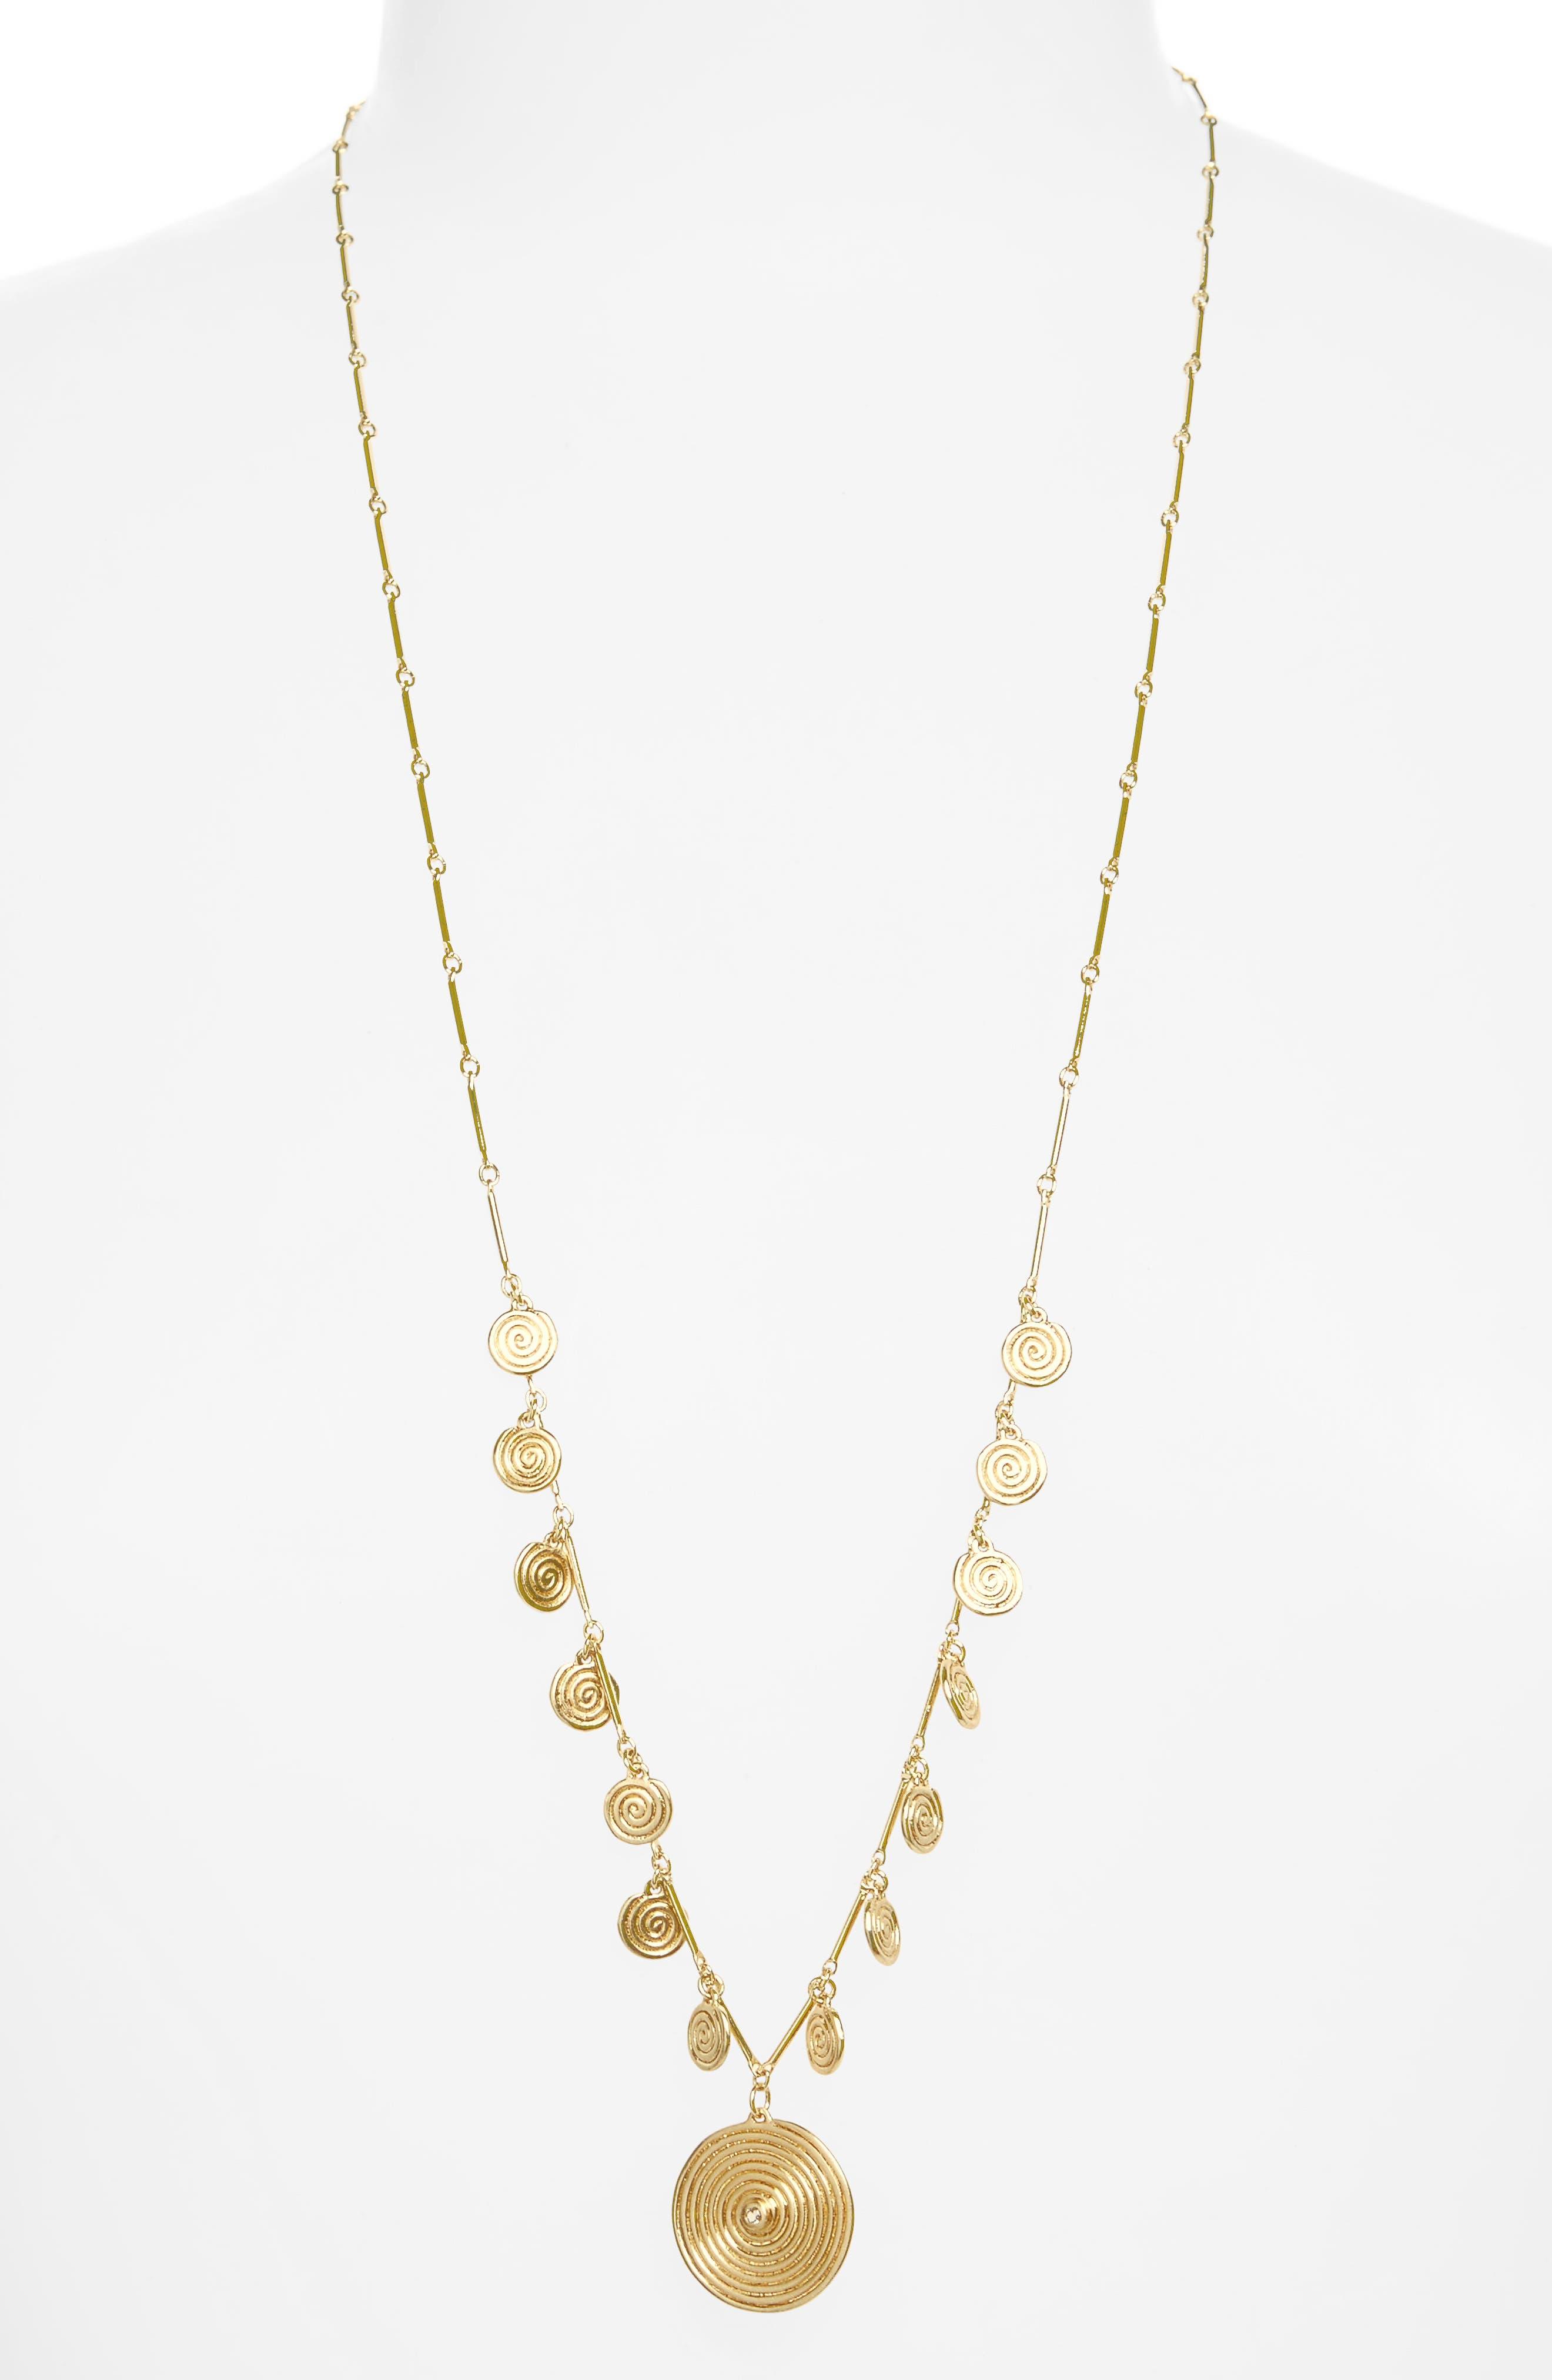 Elizabeth and James Sullivan - Ashlyn White Topaz Pendant Necklace